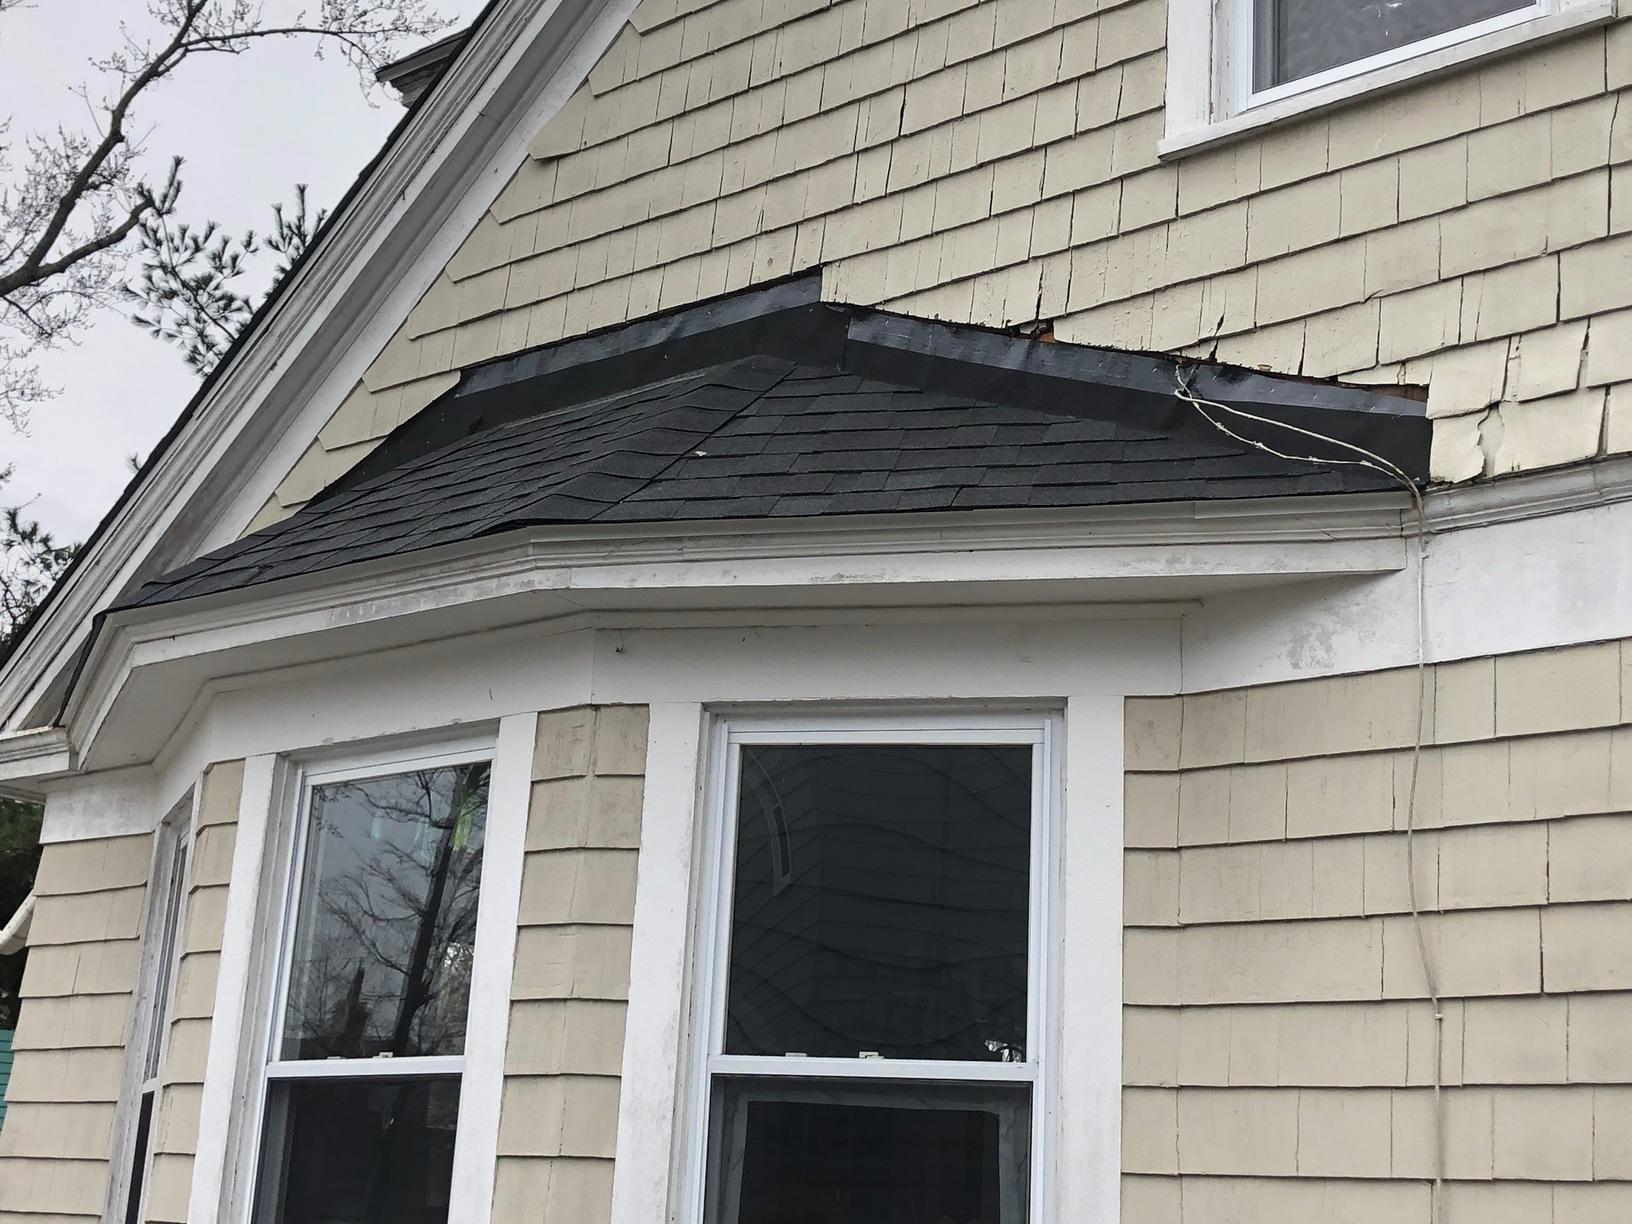 CT Gutter Makes Corrections to Asphalt Roof | Hamden, CT